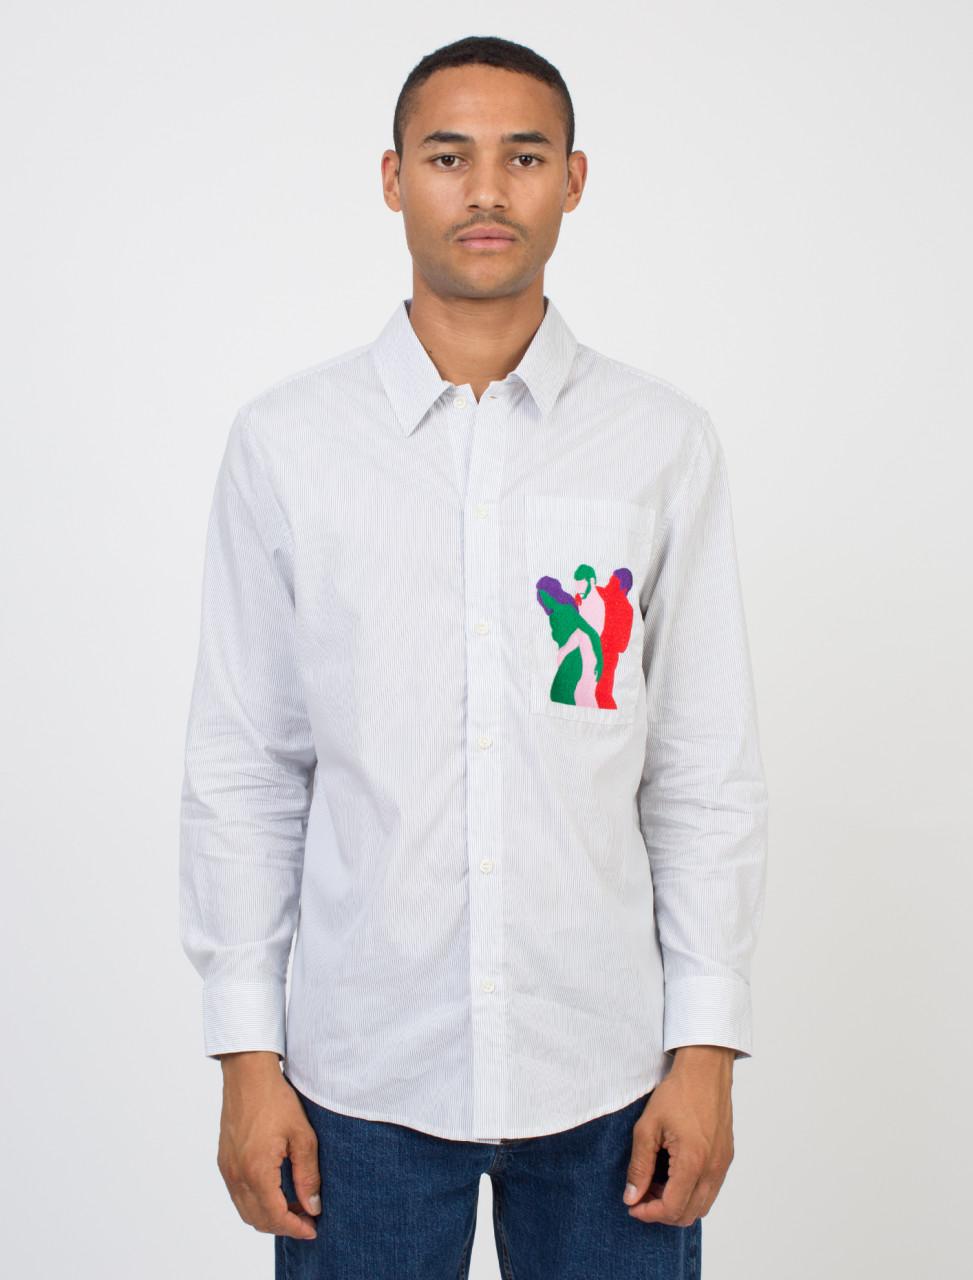 Pulp Friction Shirt